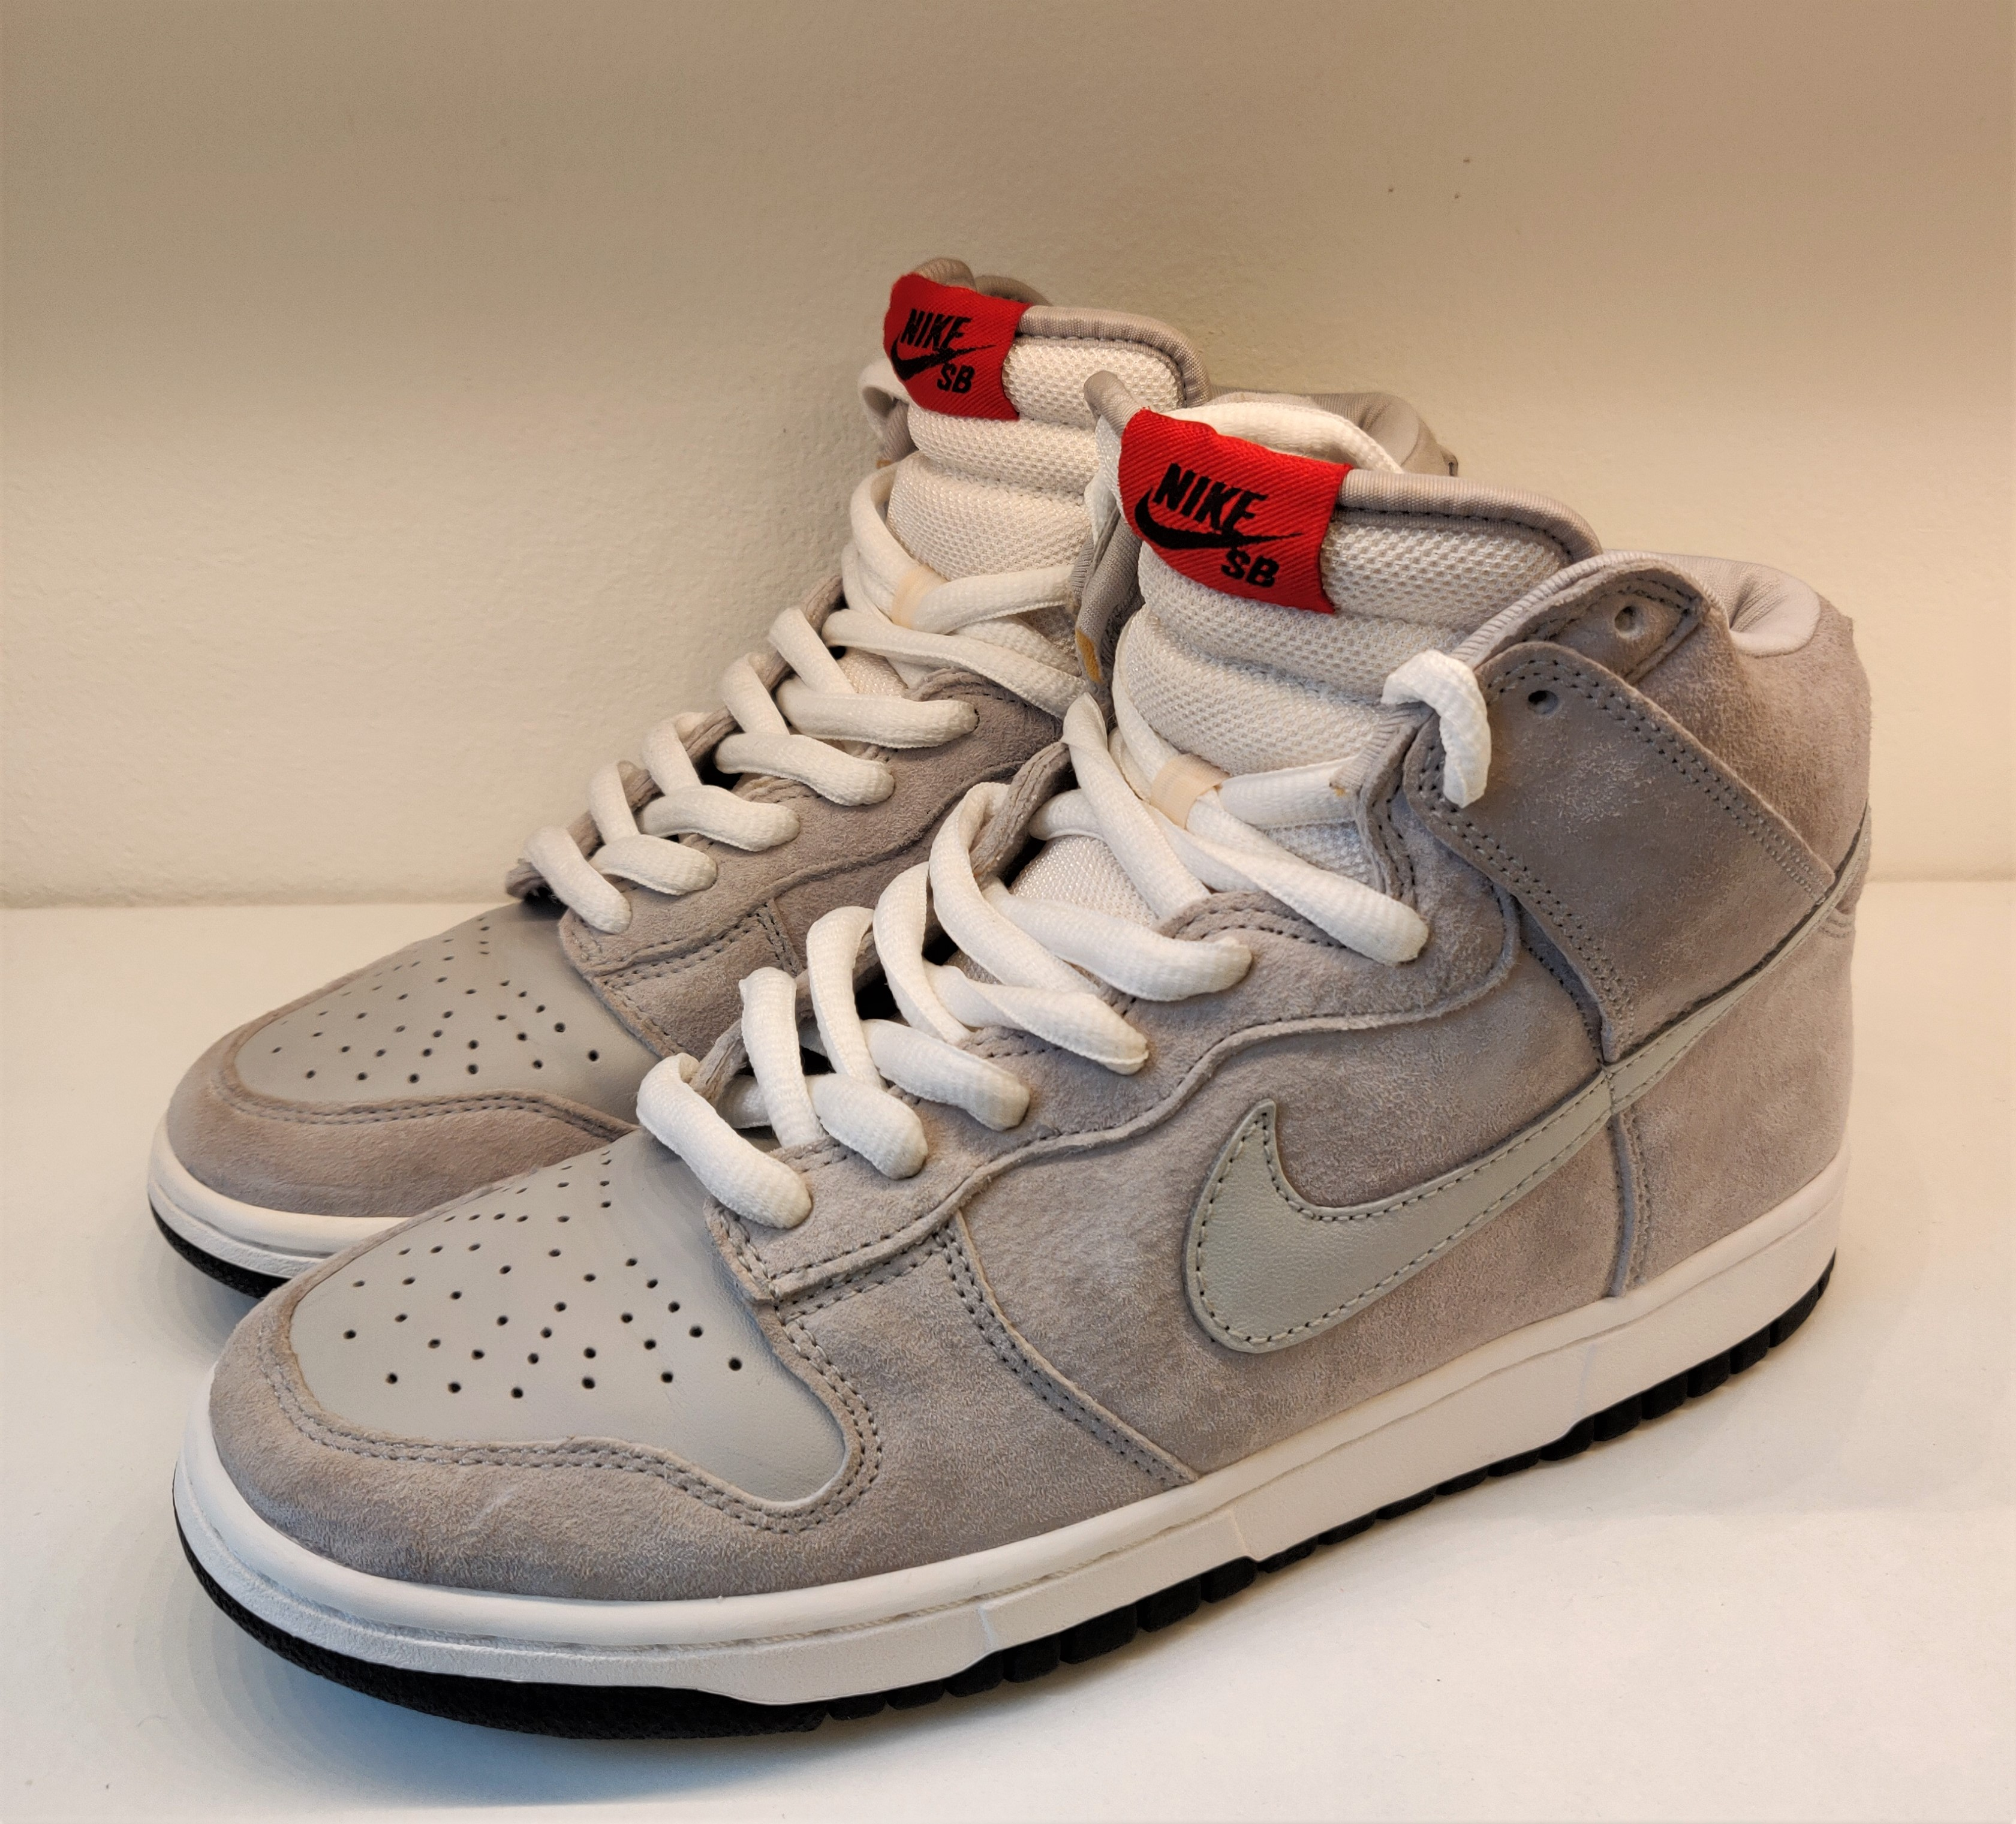 Nike SB Dunk High Pee Wee Herman